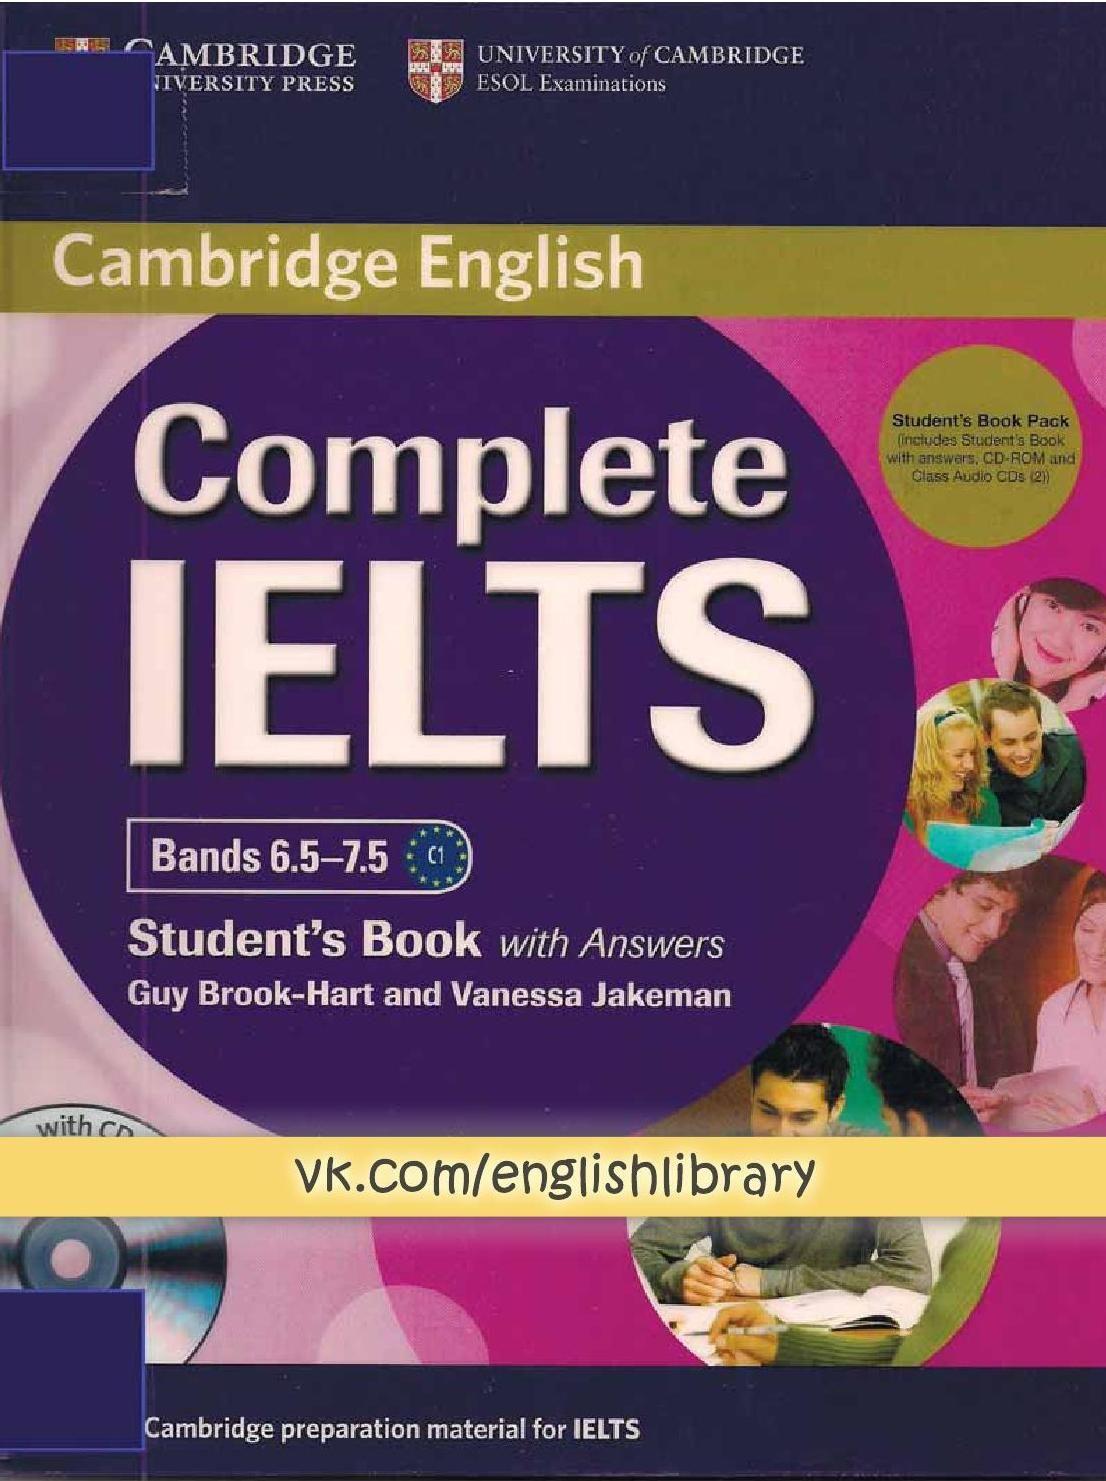 Complete ielts 75 sb | Language Tests : IELTS | Ielts